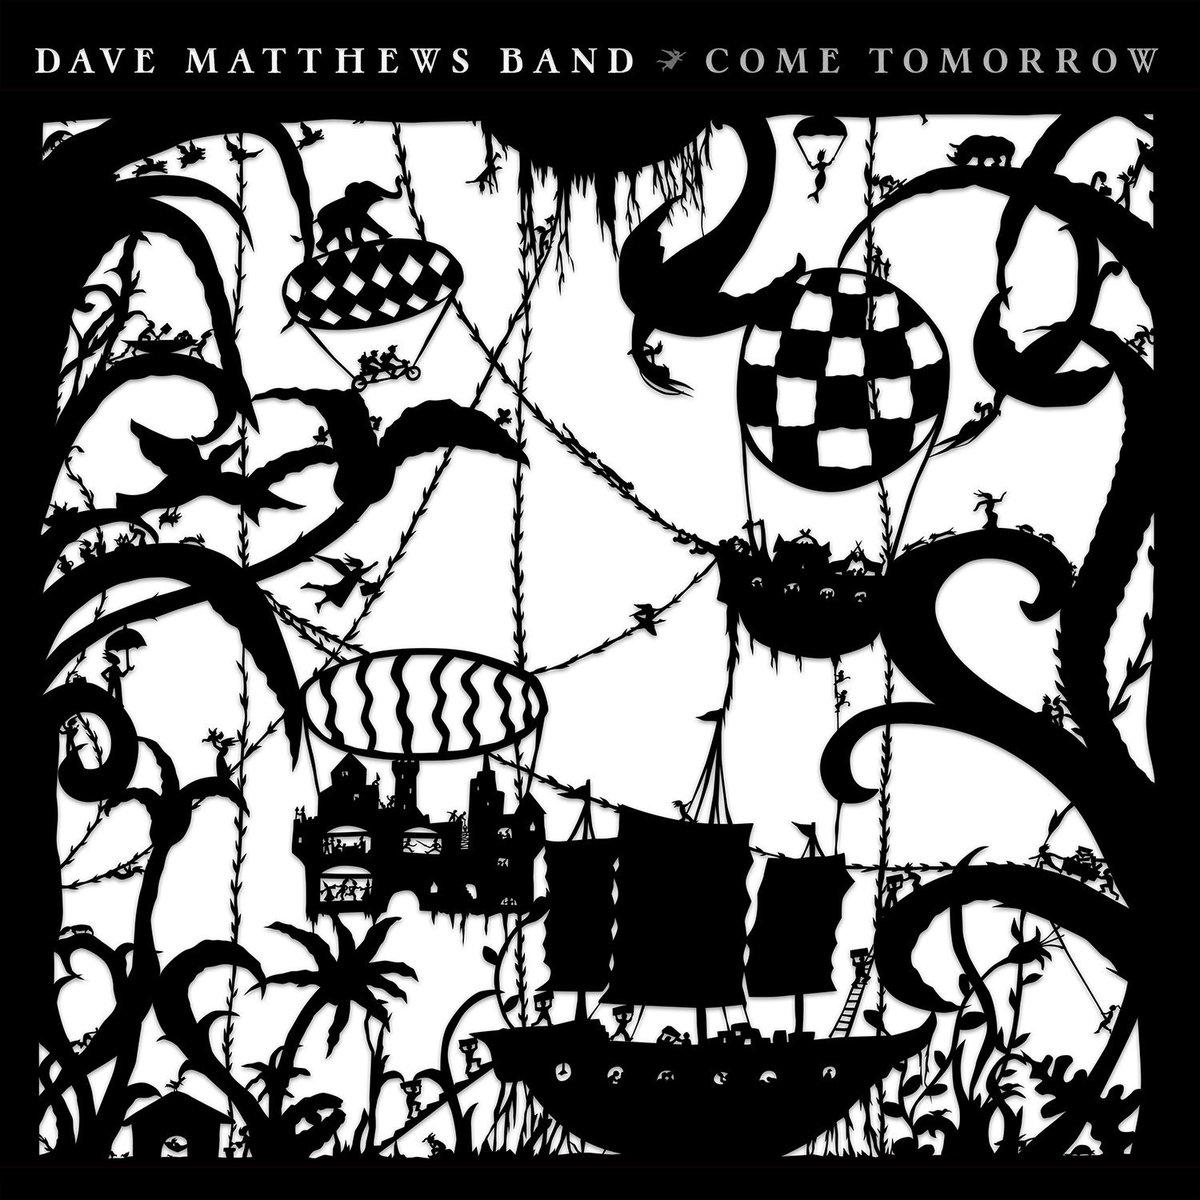 MATTHEWS DAVE BAND – Come Tomorrow